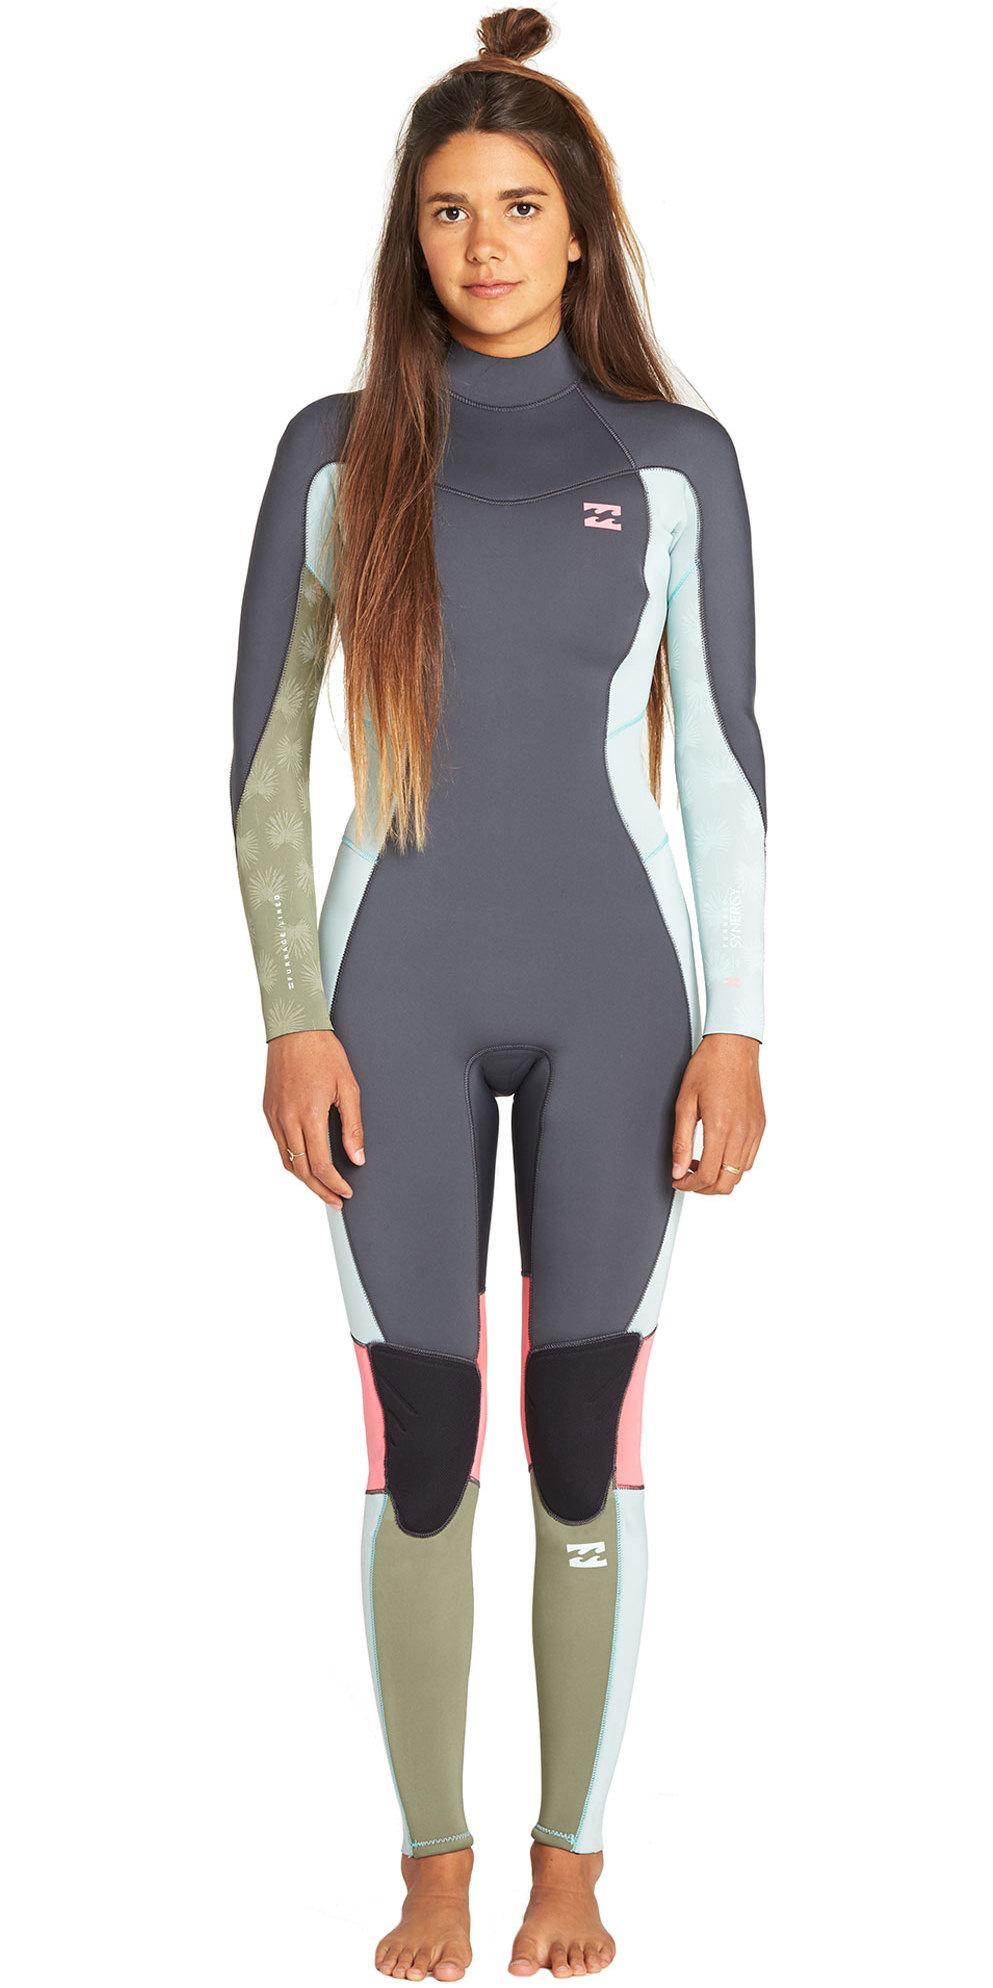 2019 Billabong Womens Furnace Synergy 3 2mm Back Zip GBS Wetsuit Seafoam  N43G04 ... 687382a49